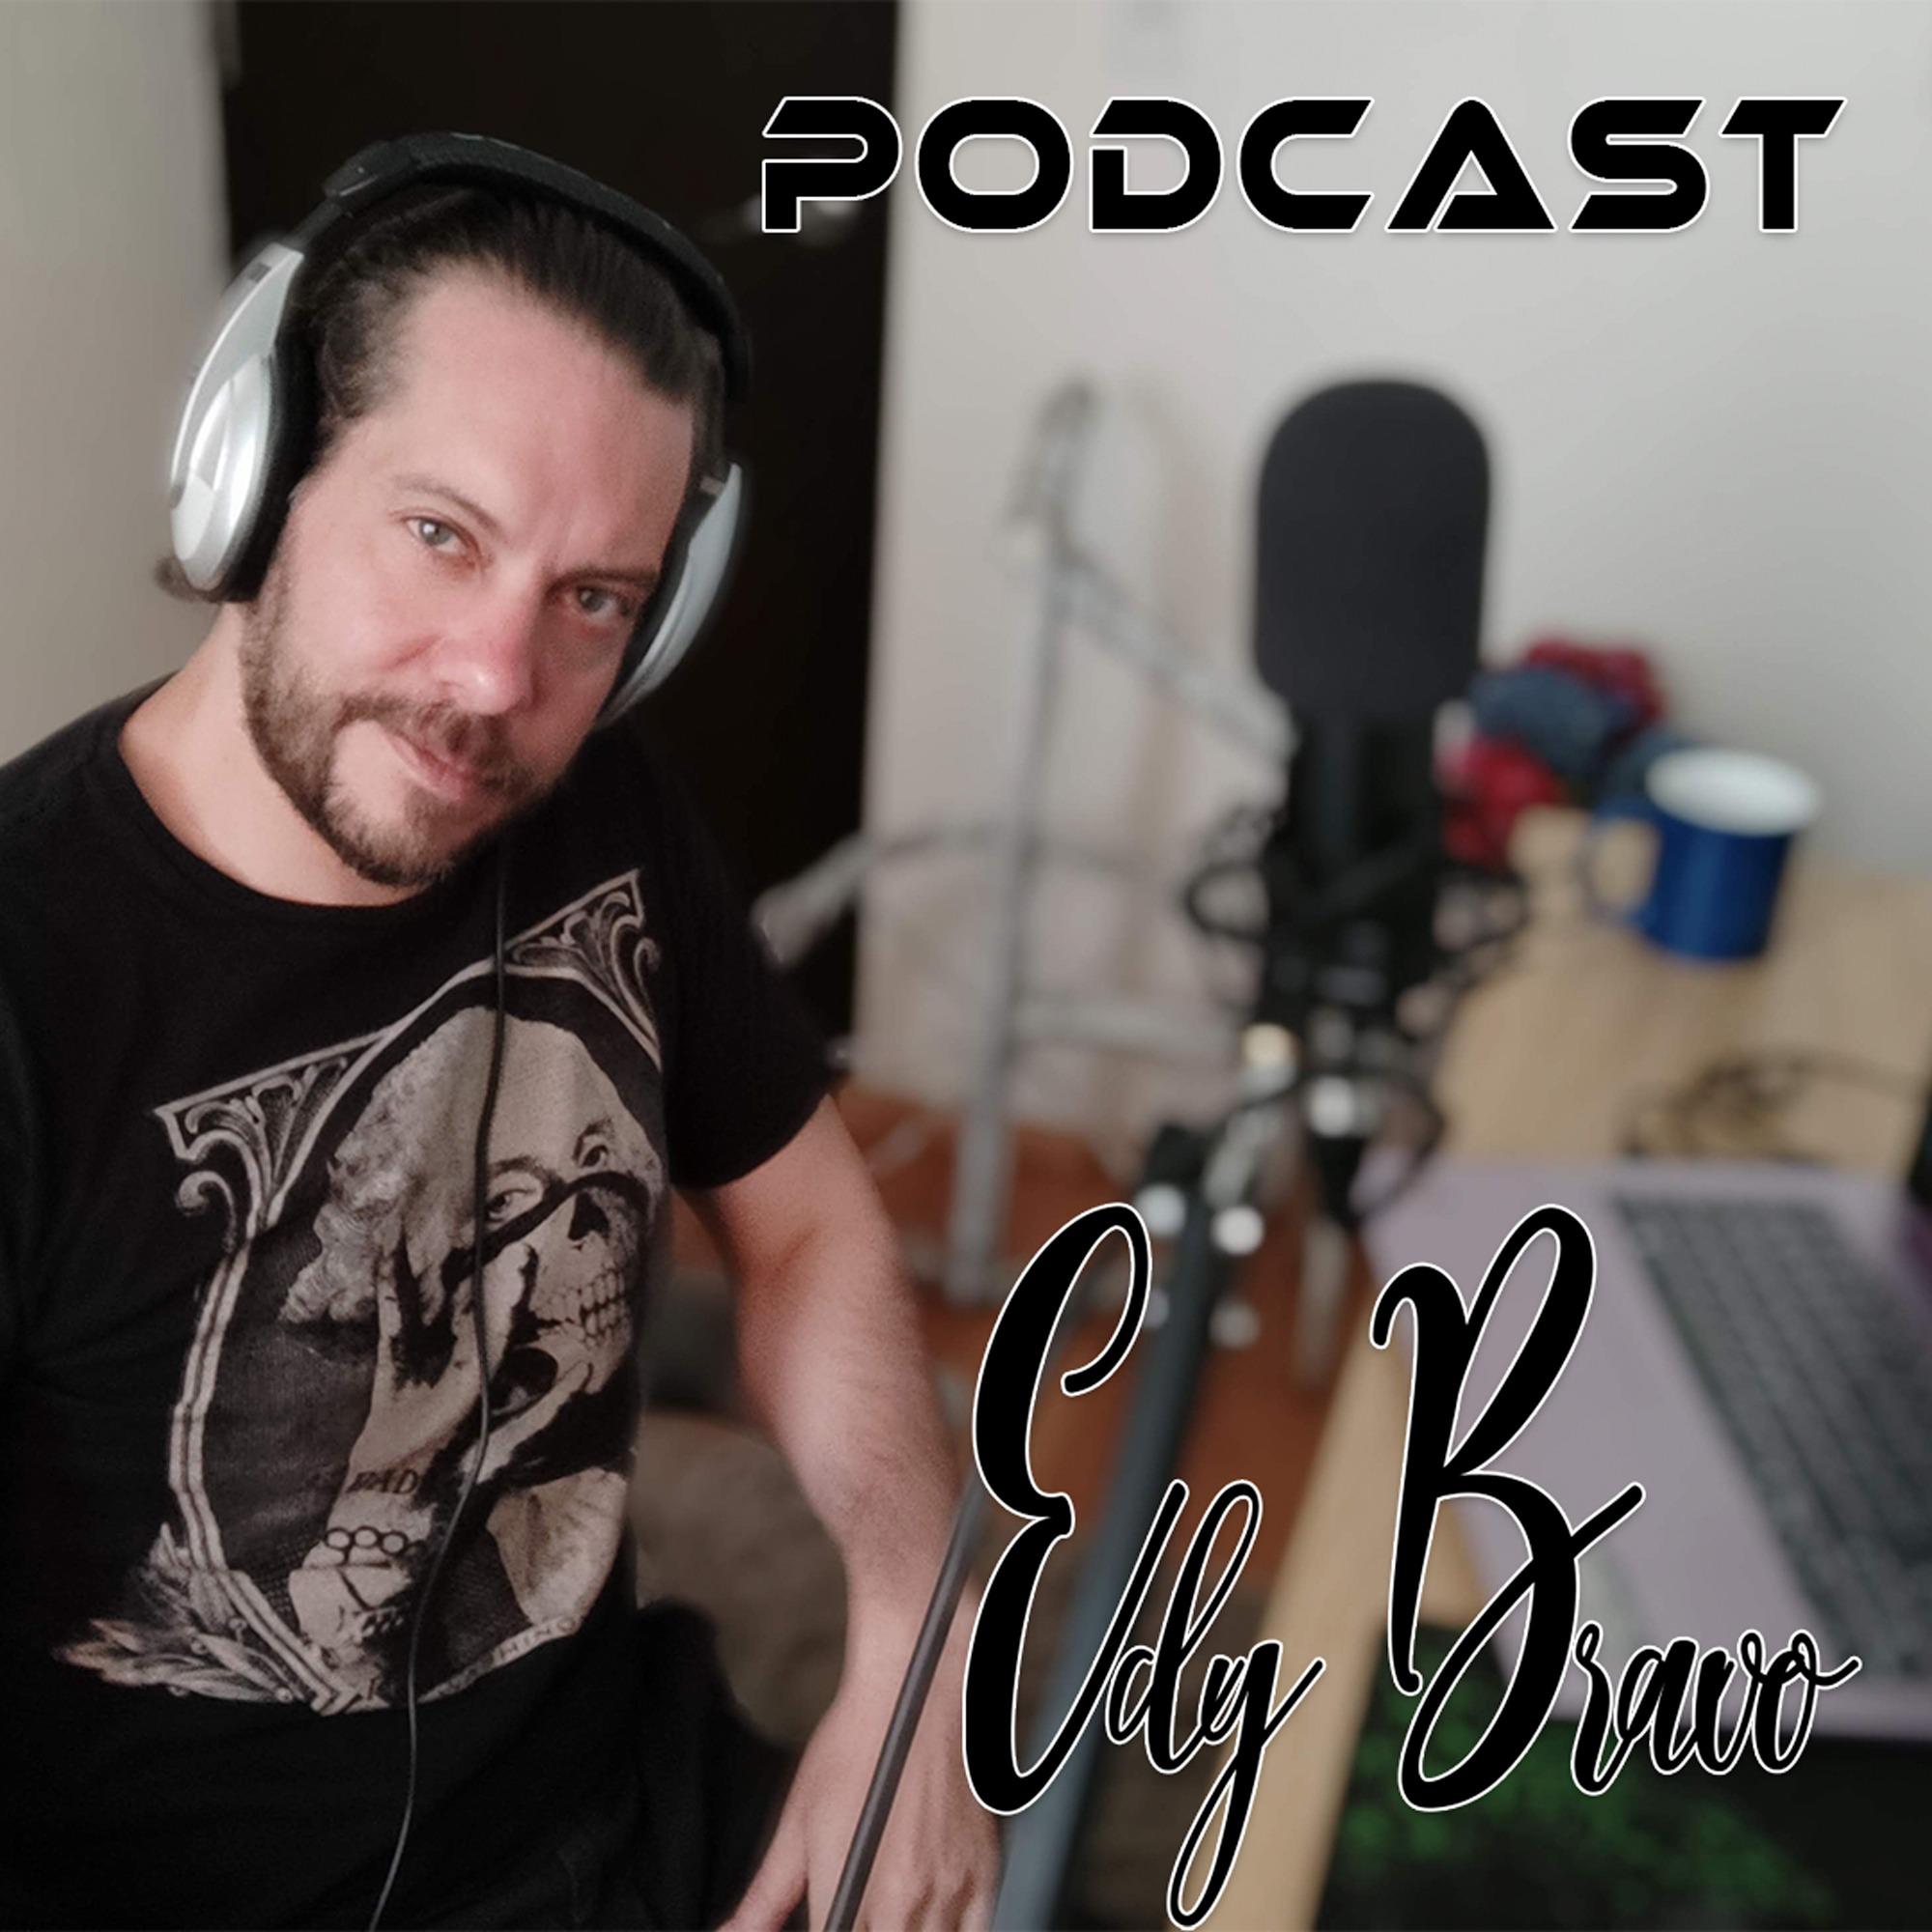 El podcast de edy bravo en spotify, web, itunes, google podcast